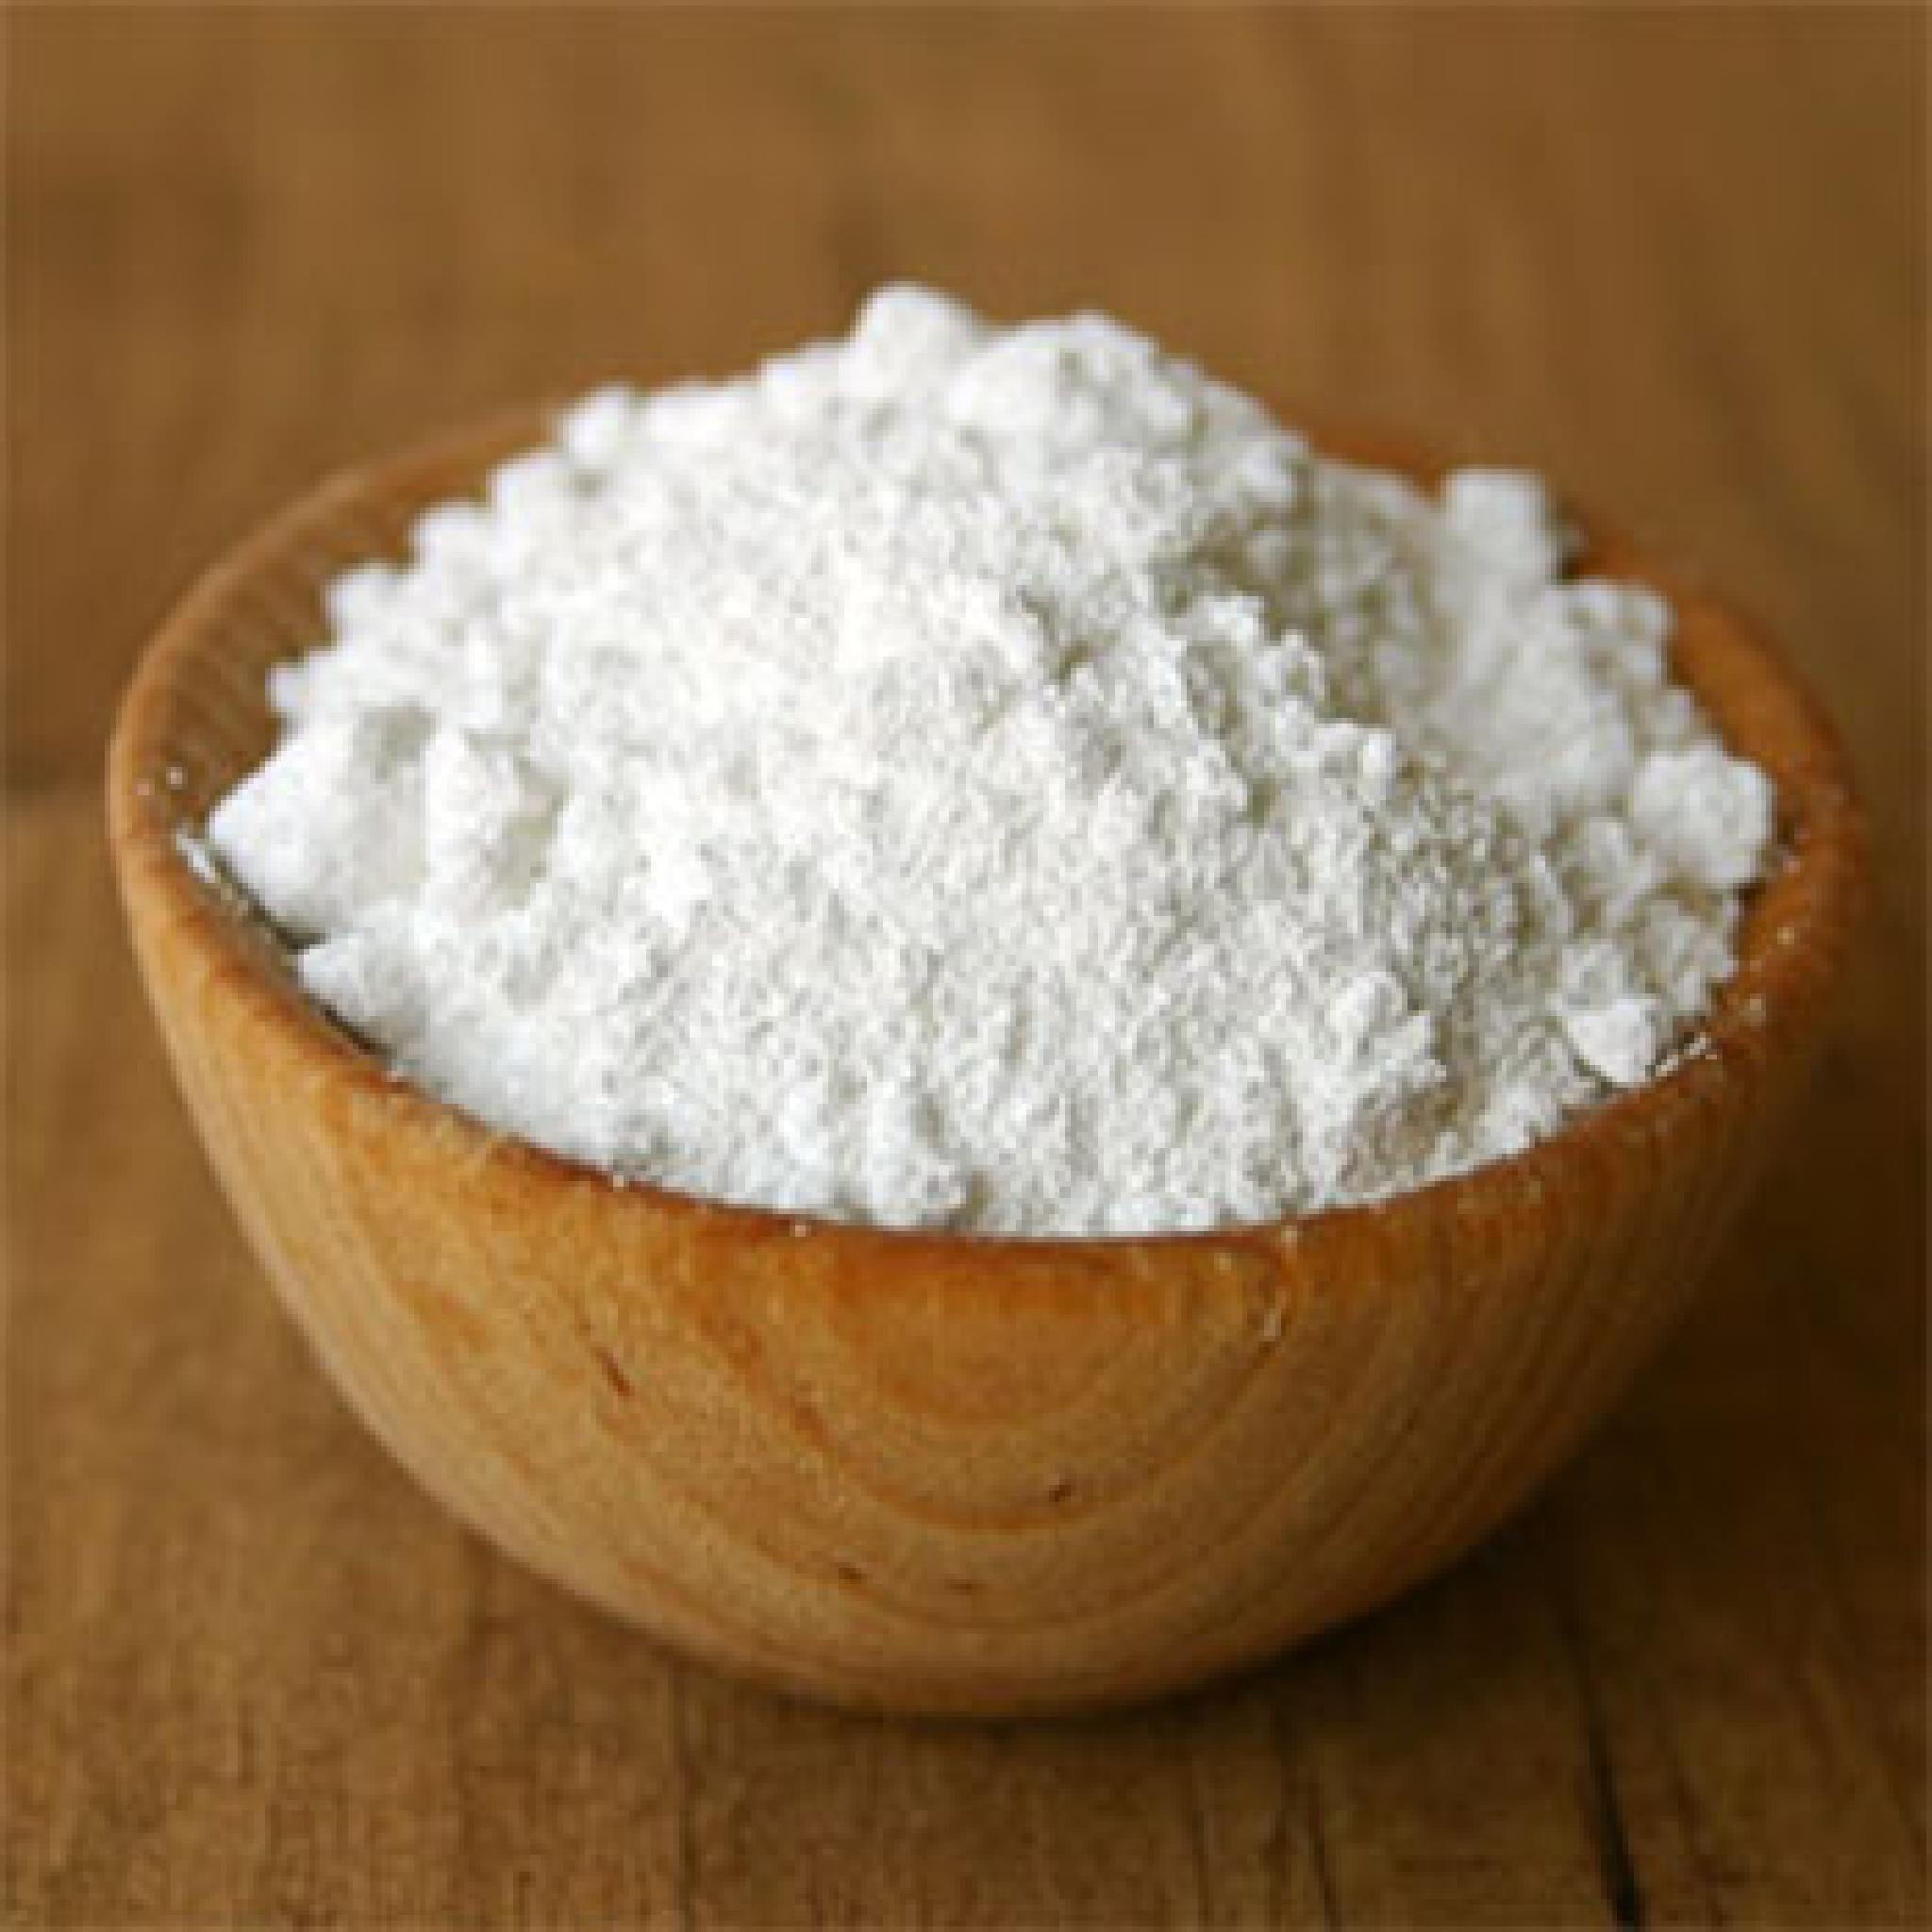 Dez Usos Do Bicarbonato De Sodio Dicas De Limpeza Como Limpar